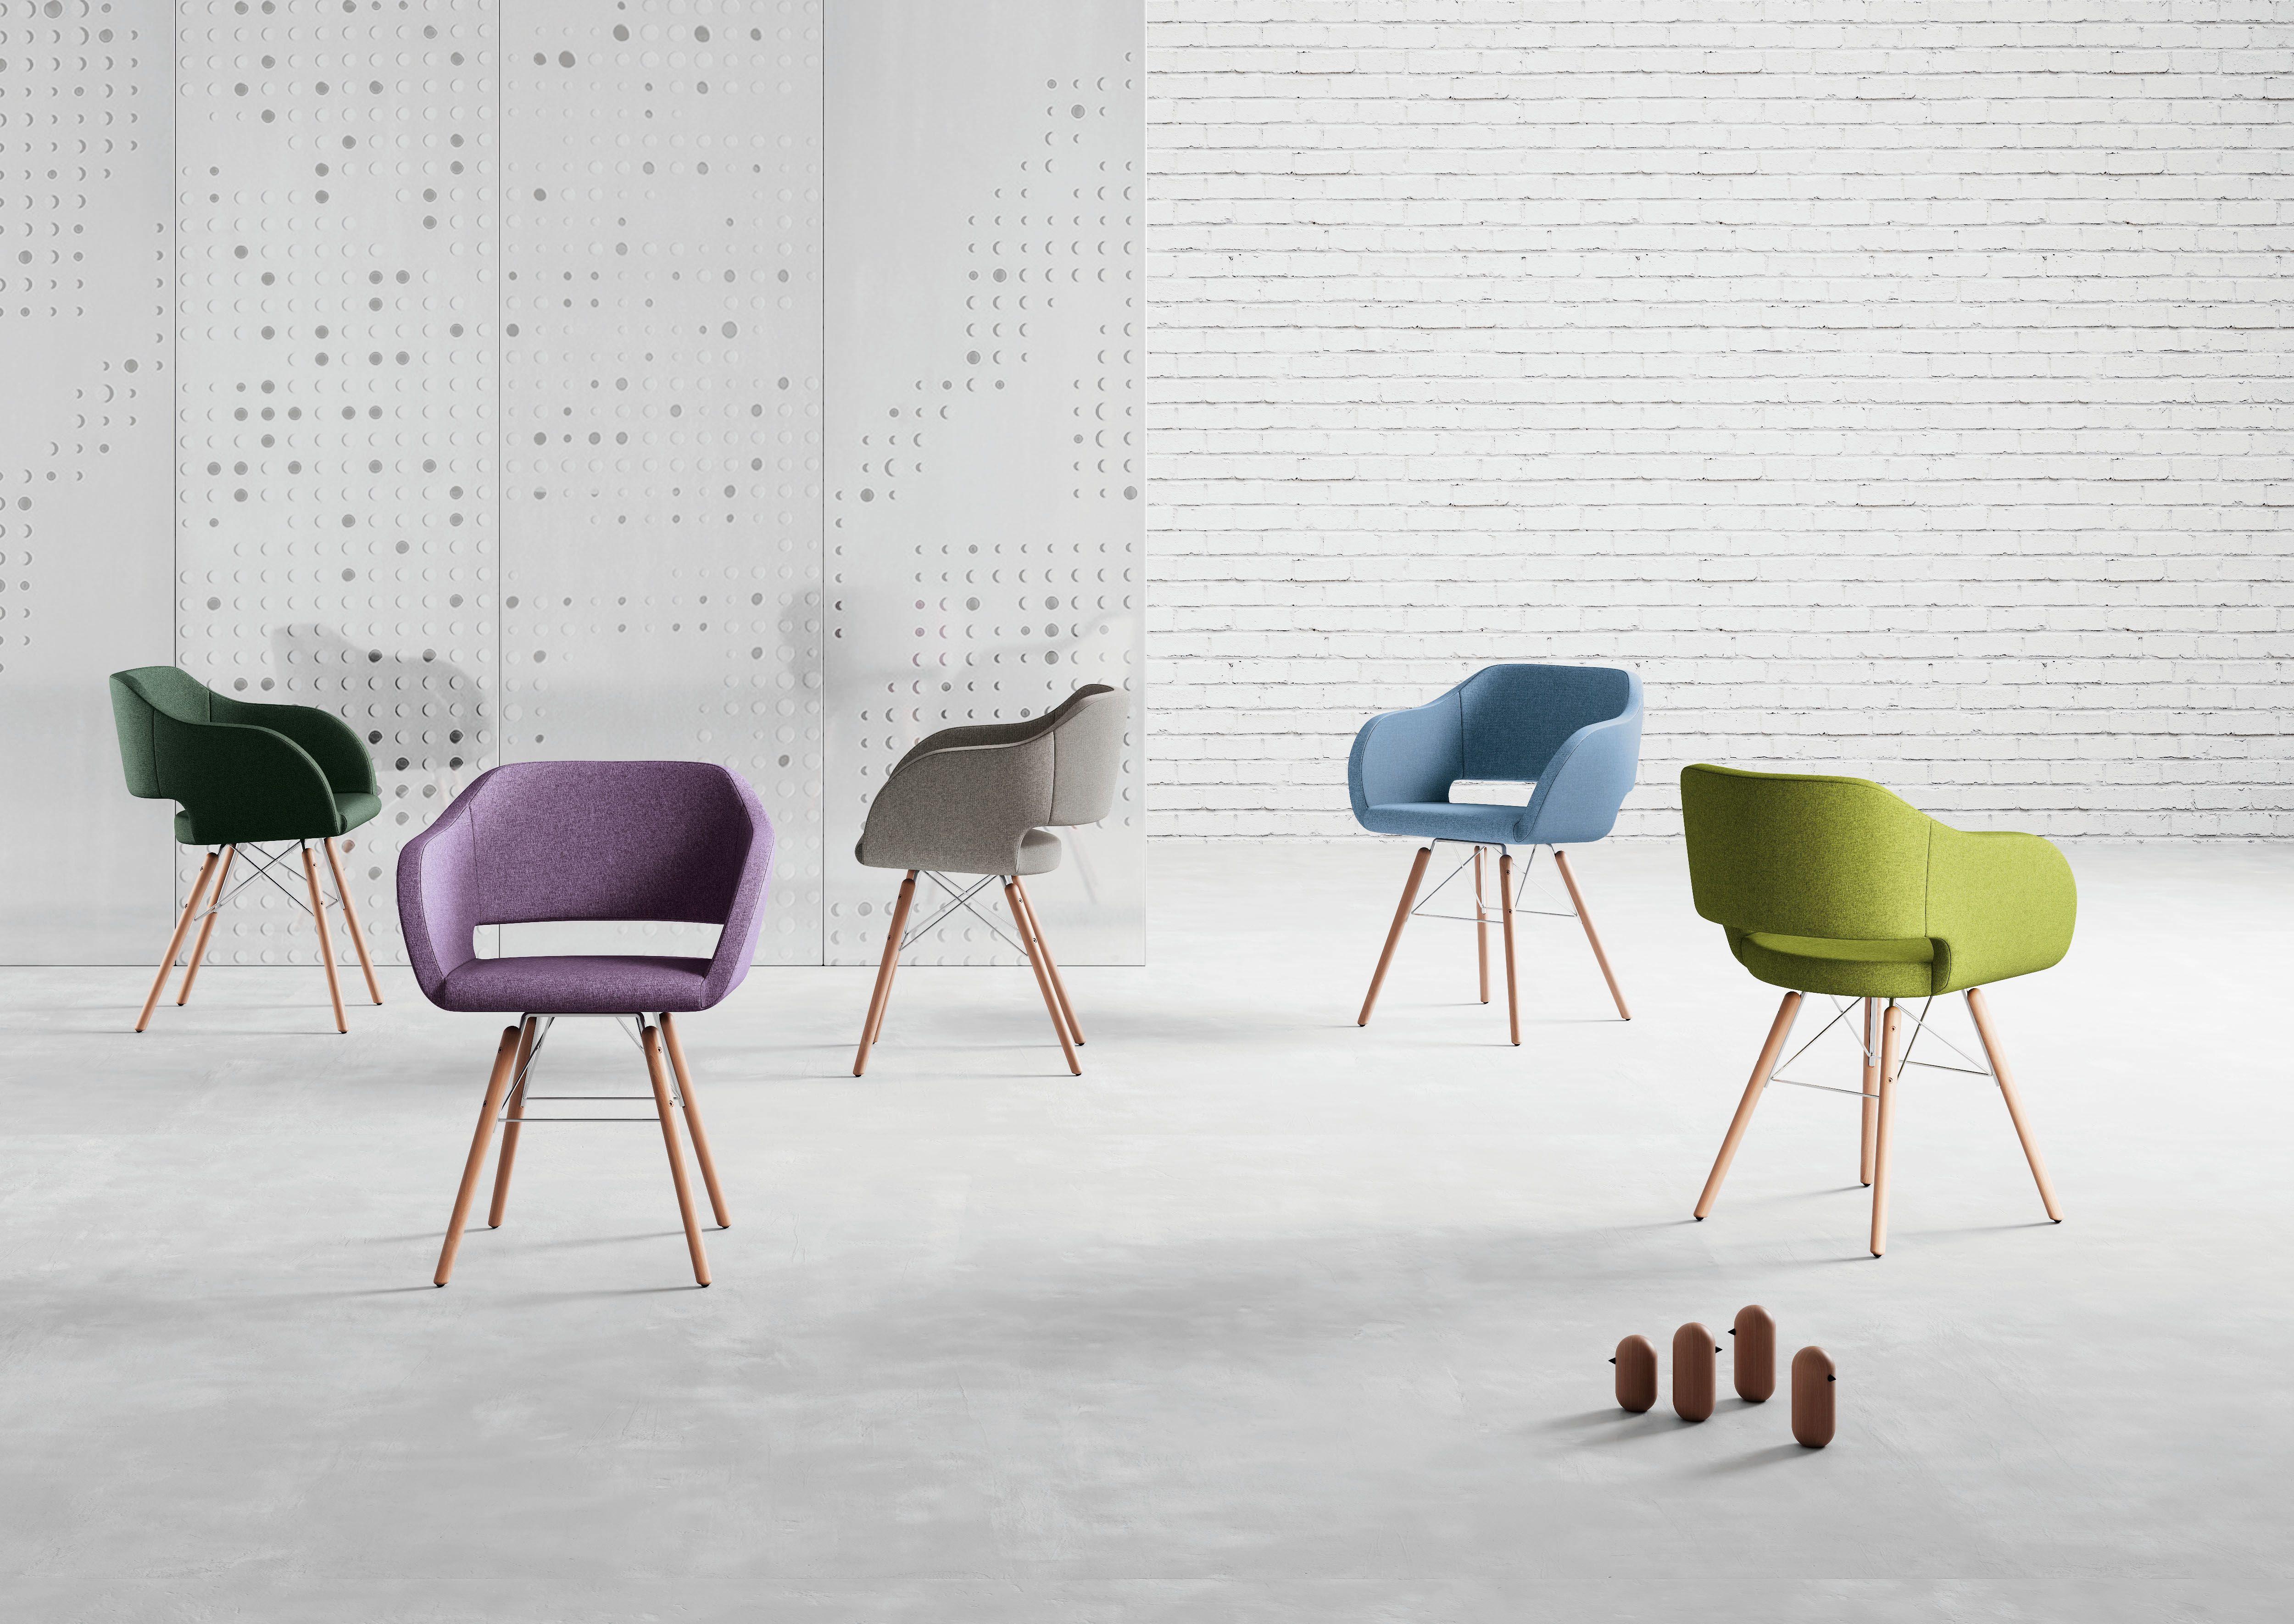 Chaises Salle D Attente Cabinet Medical idéal pour vos salles d'attente ou en chaises de réunion